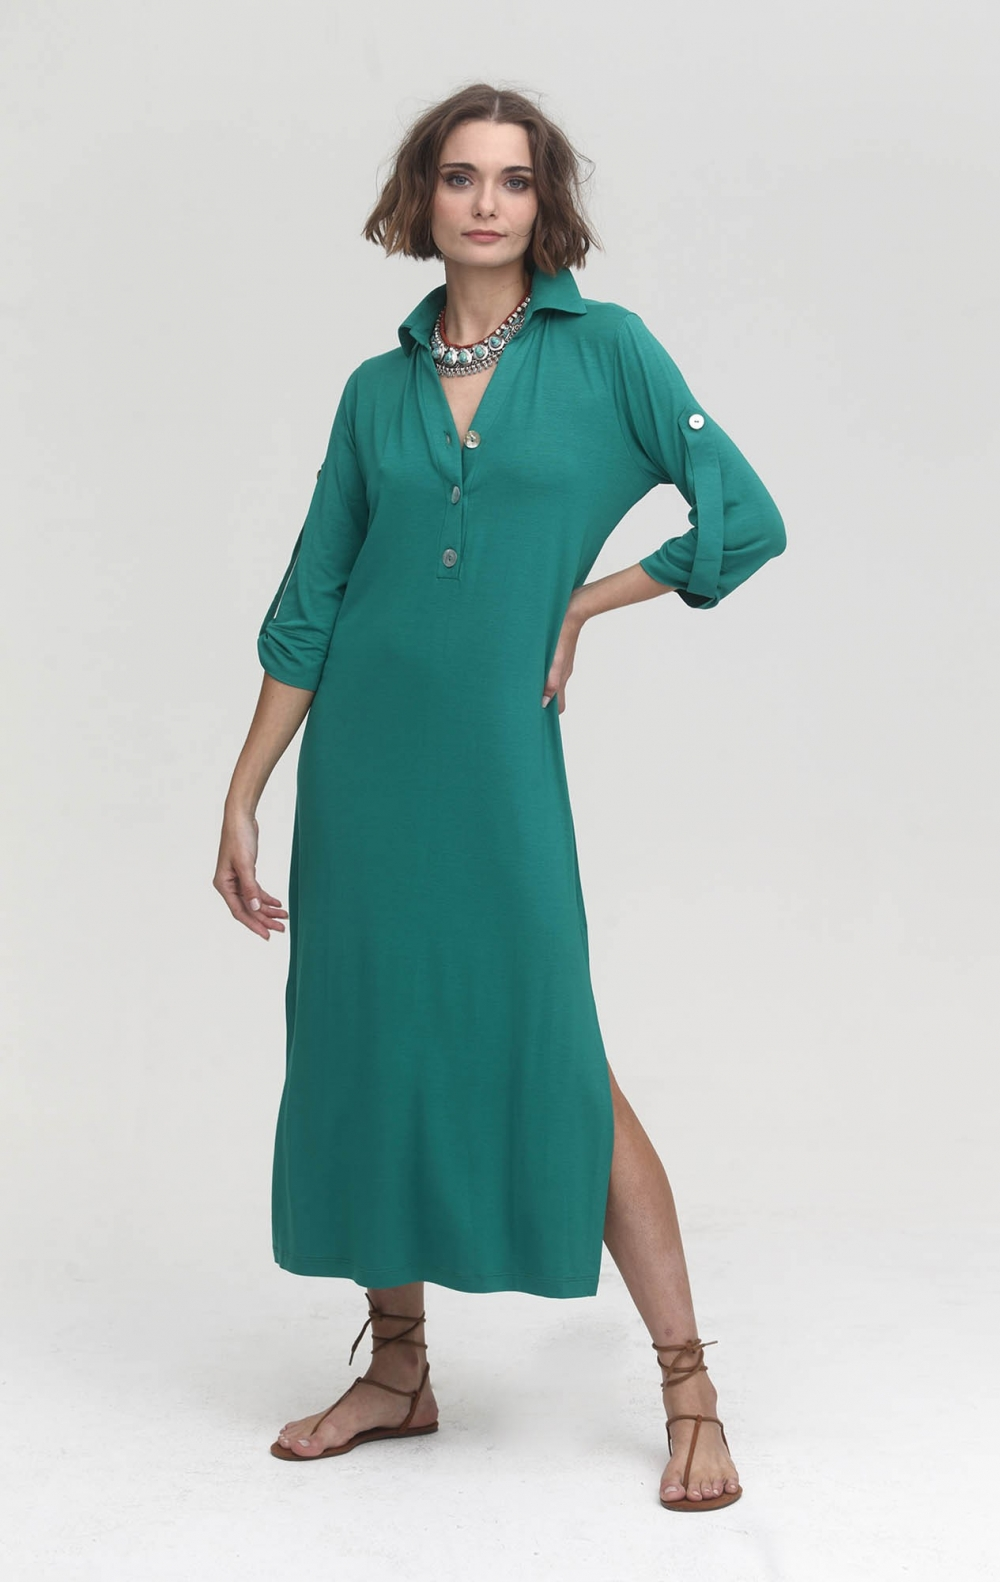 Vestido Malha Gola Polo Verde  - Foto 1